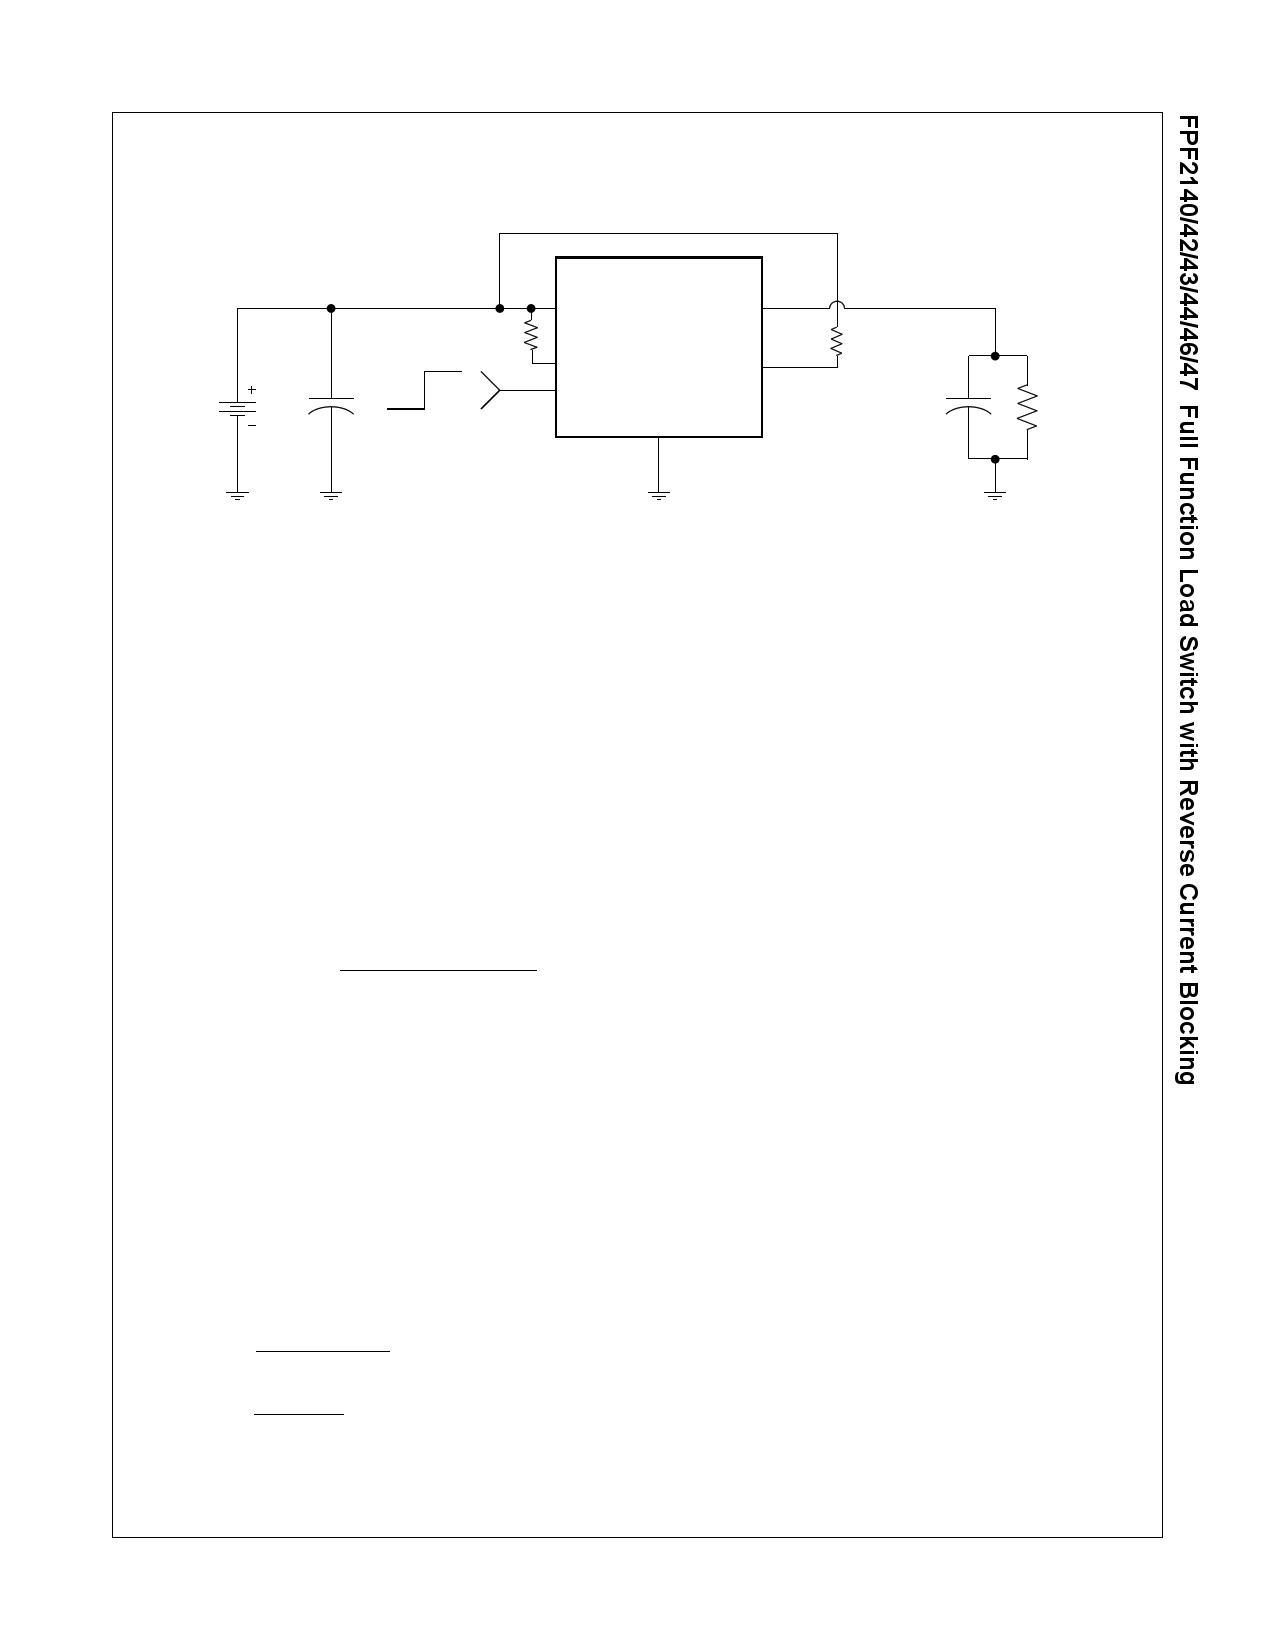 FPF2146 arduino